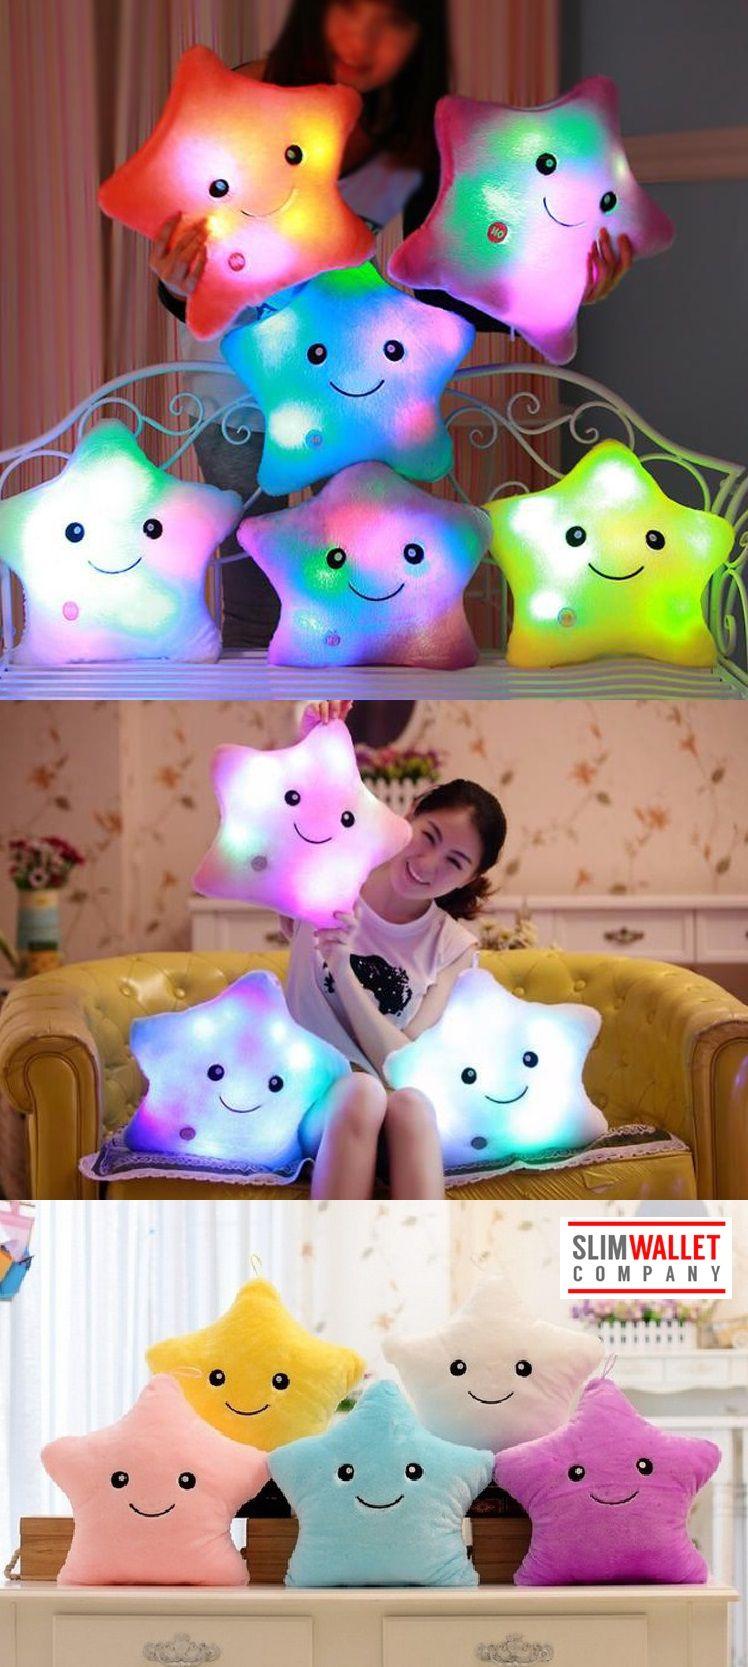 Cute LED Light Up Pillows Life